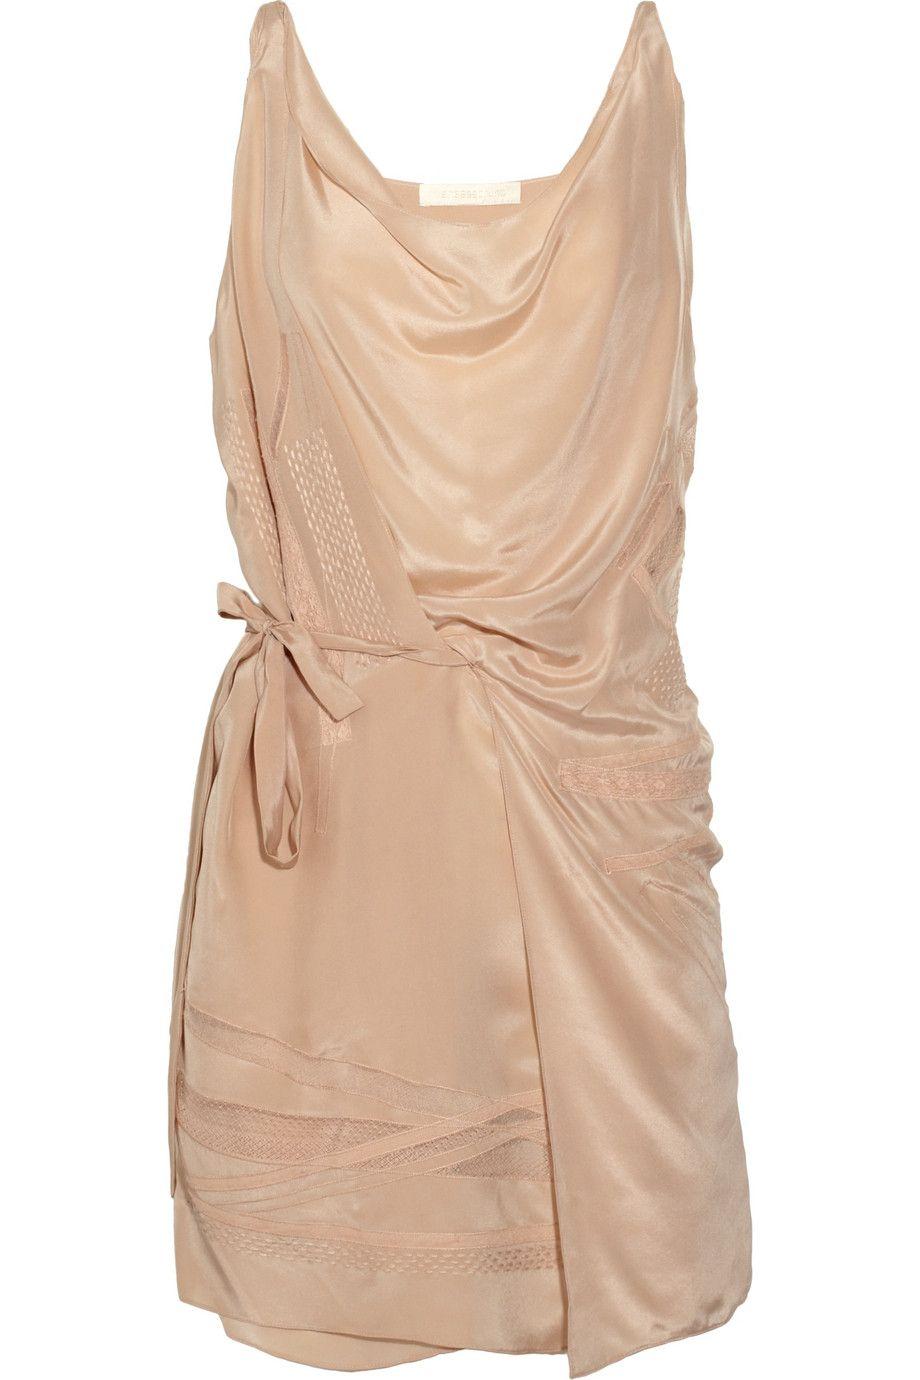 fa8e87e7600 Vanessa Bruno Silk-charmeuse dress - 65% Off Now at THE OUTNET ...